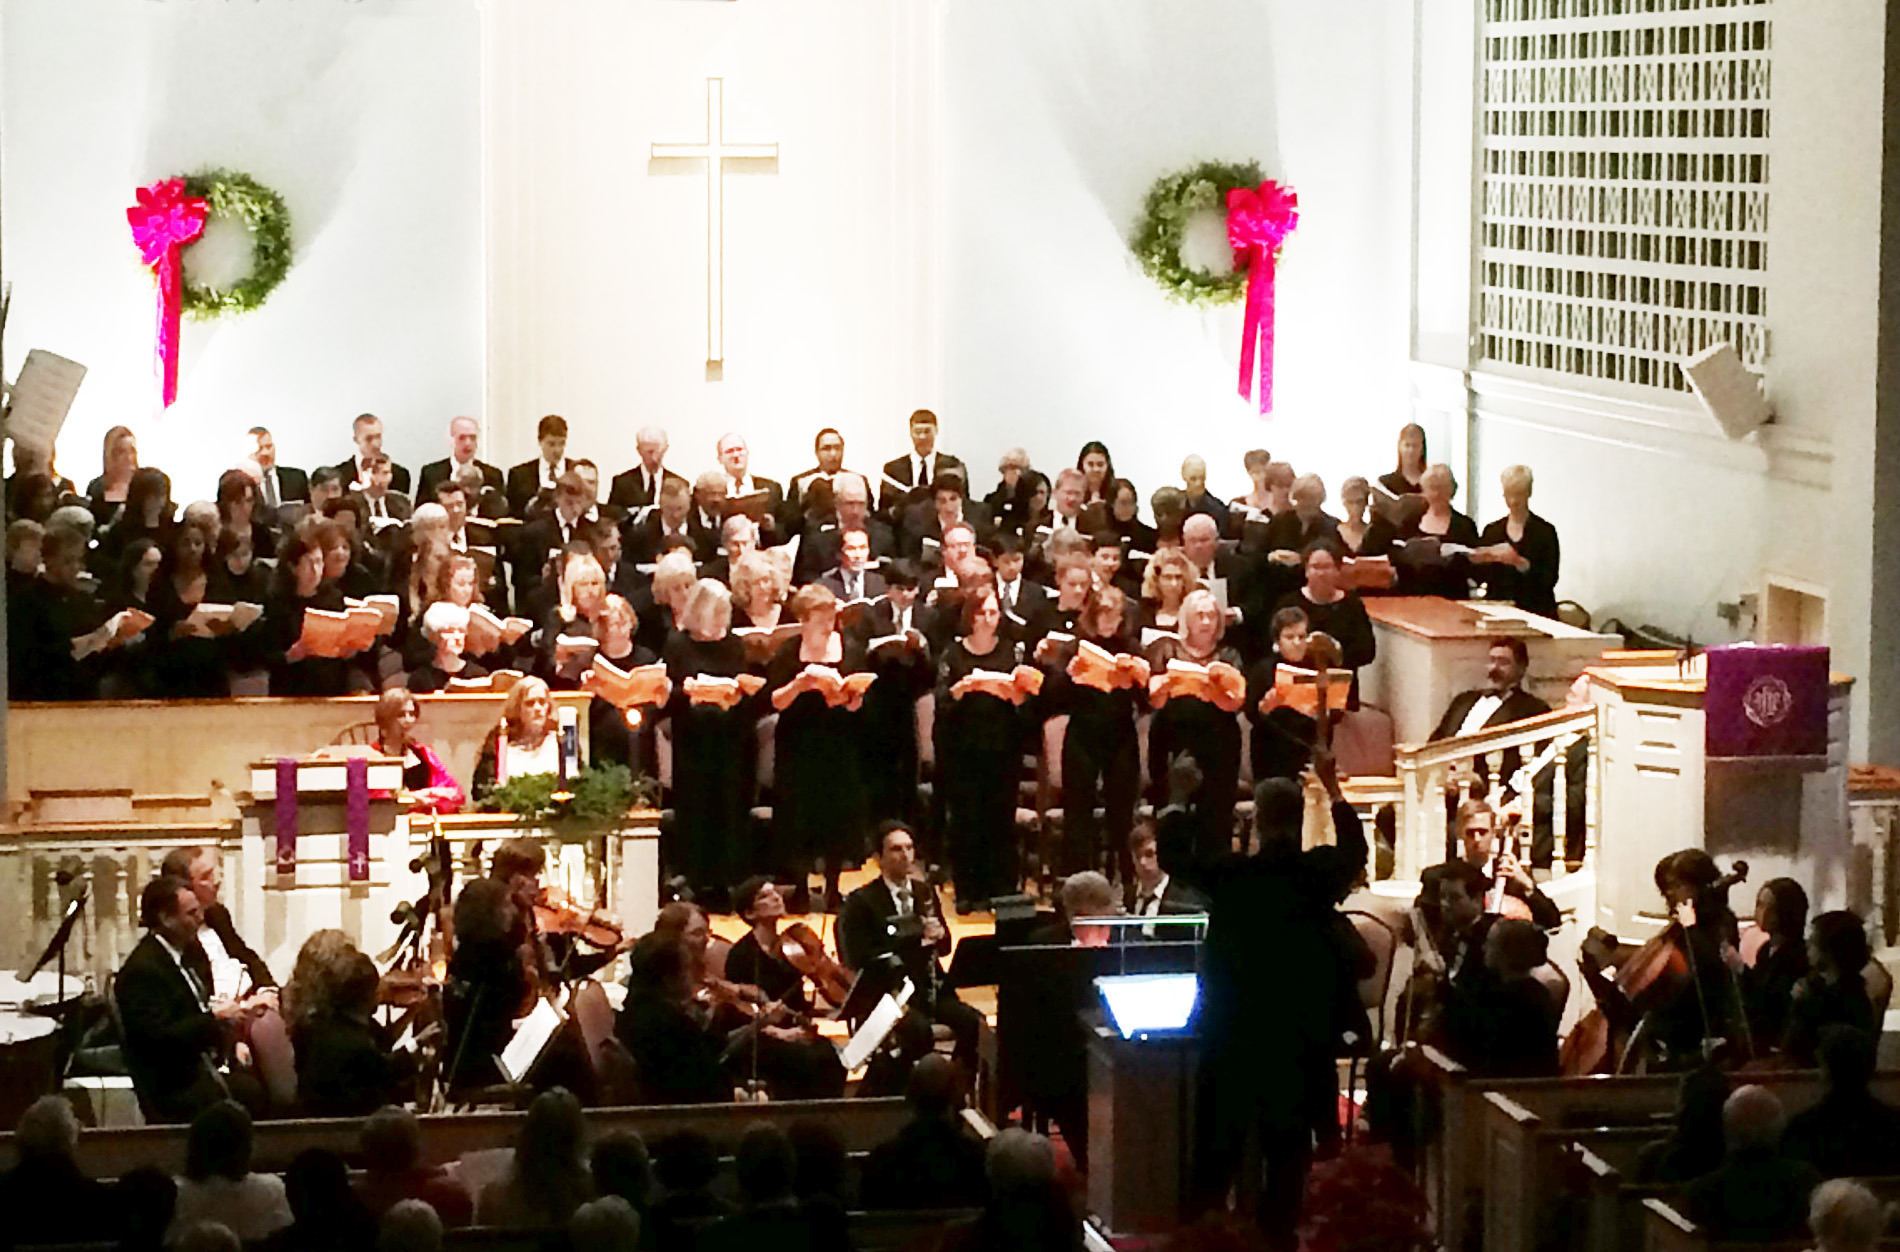 7d63bfeb379056d51a9d_Handel_s_Messiah_at_Fanwood_Presbyterian_2013.jpg